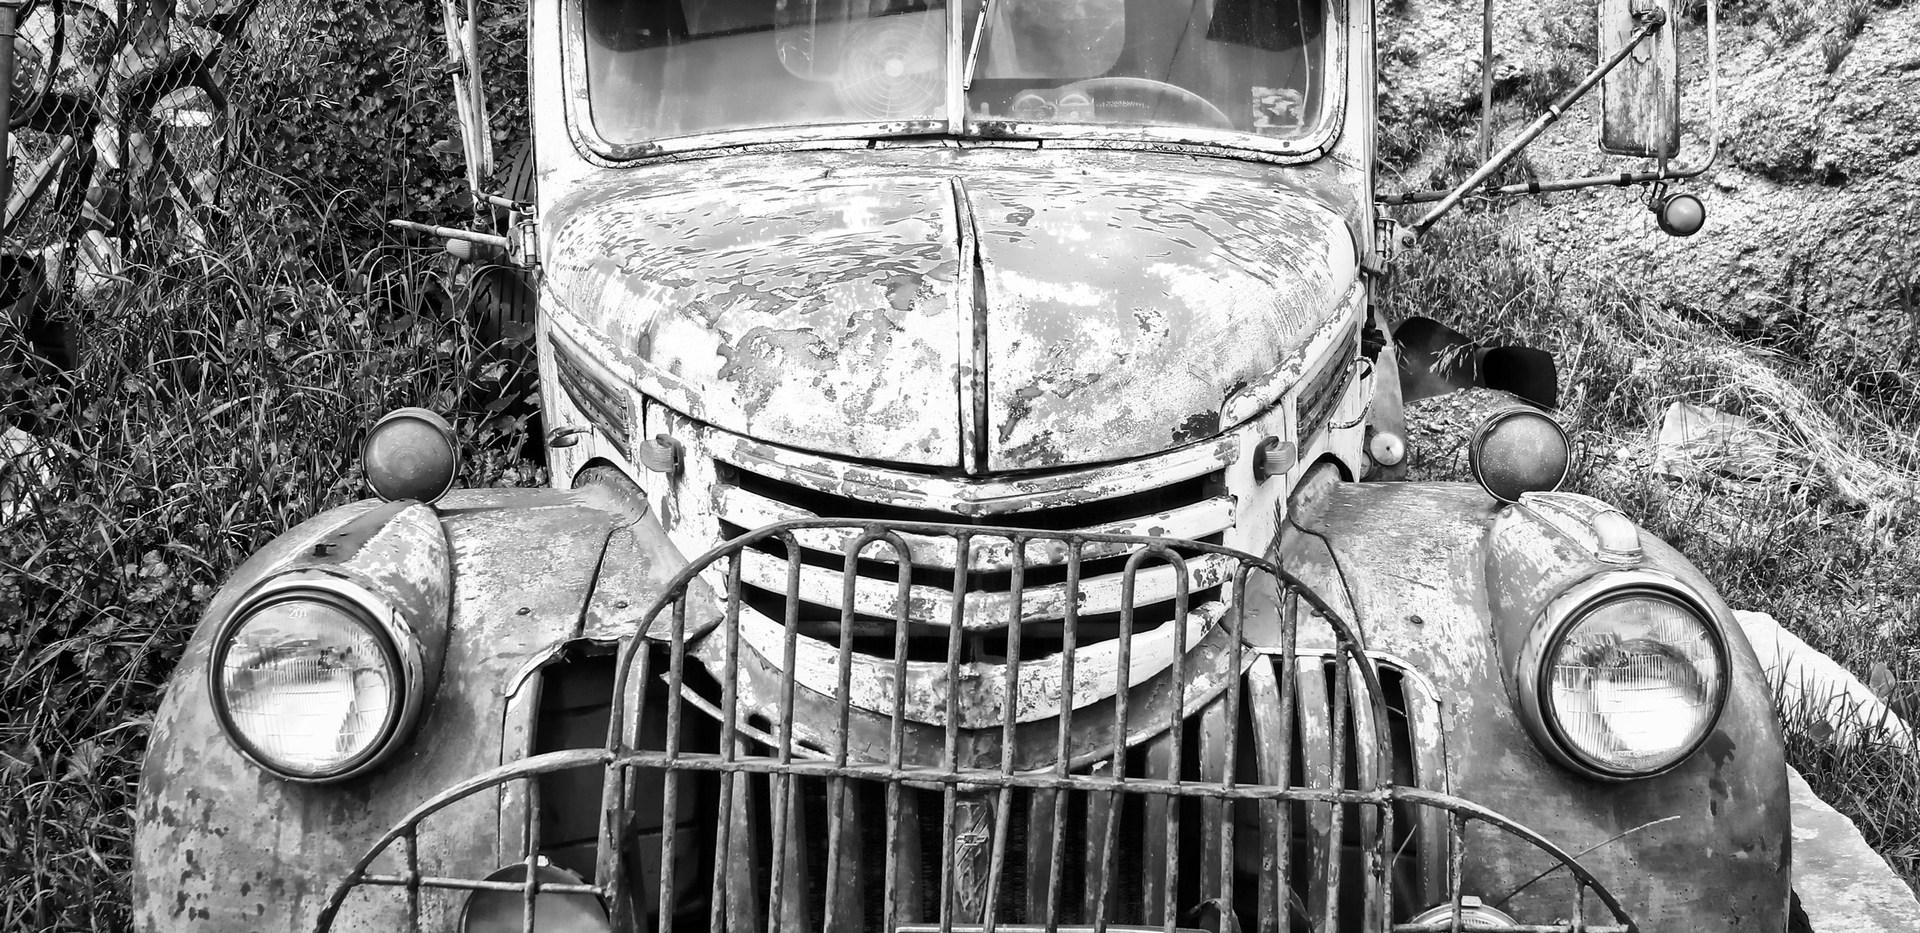 old truck in bw 2.jpg